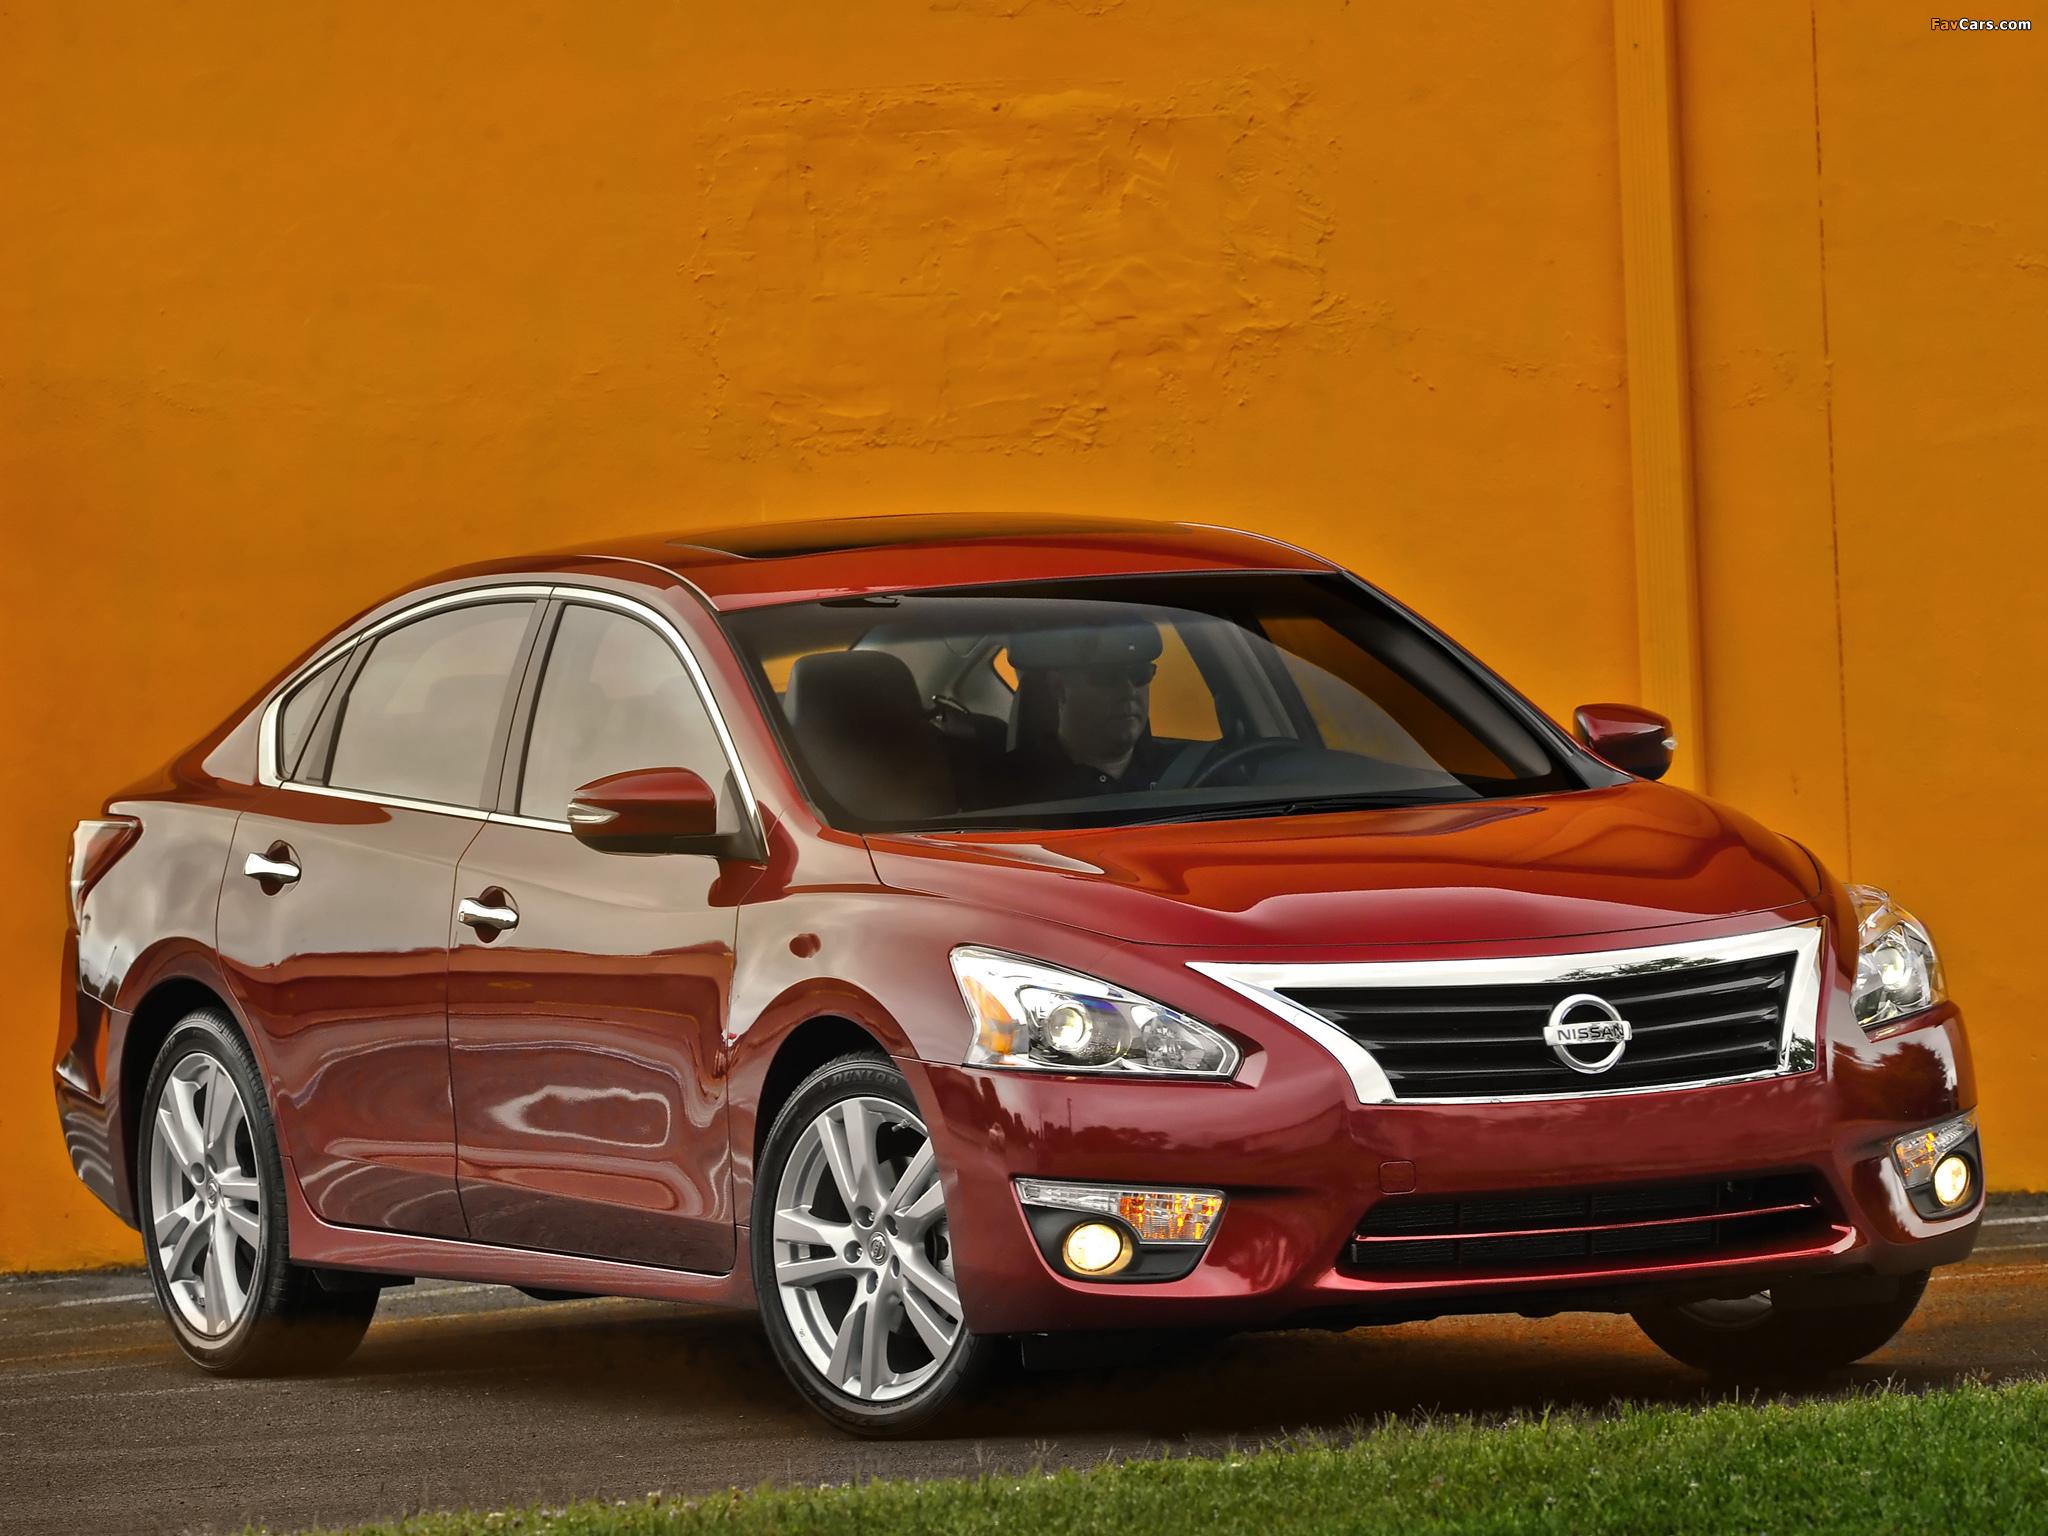 Nissan Altima (L33) 2012 pictures (2048 x 1536)